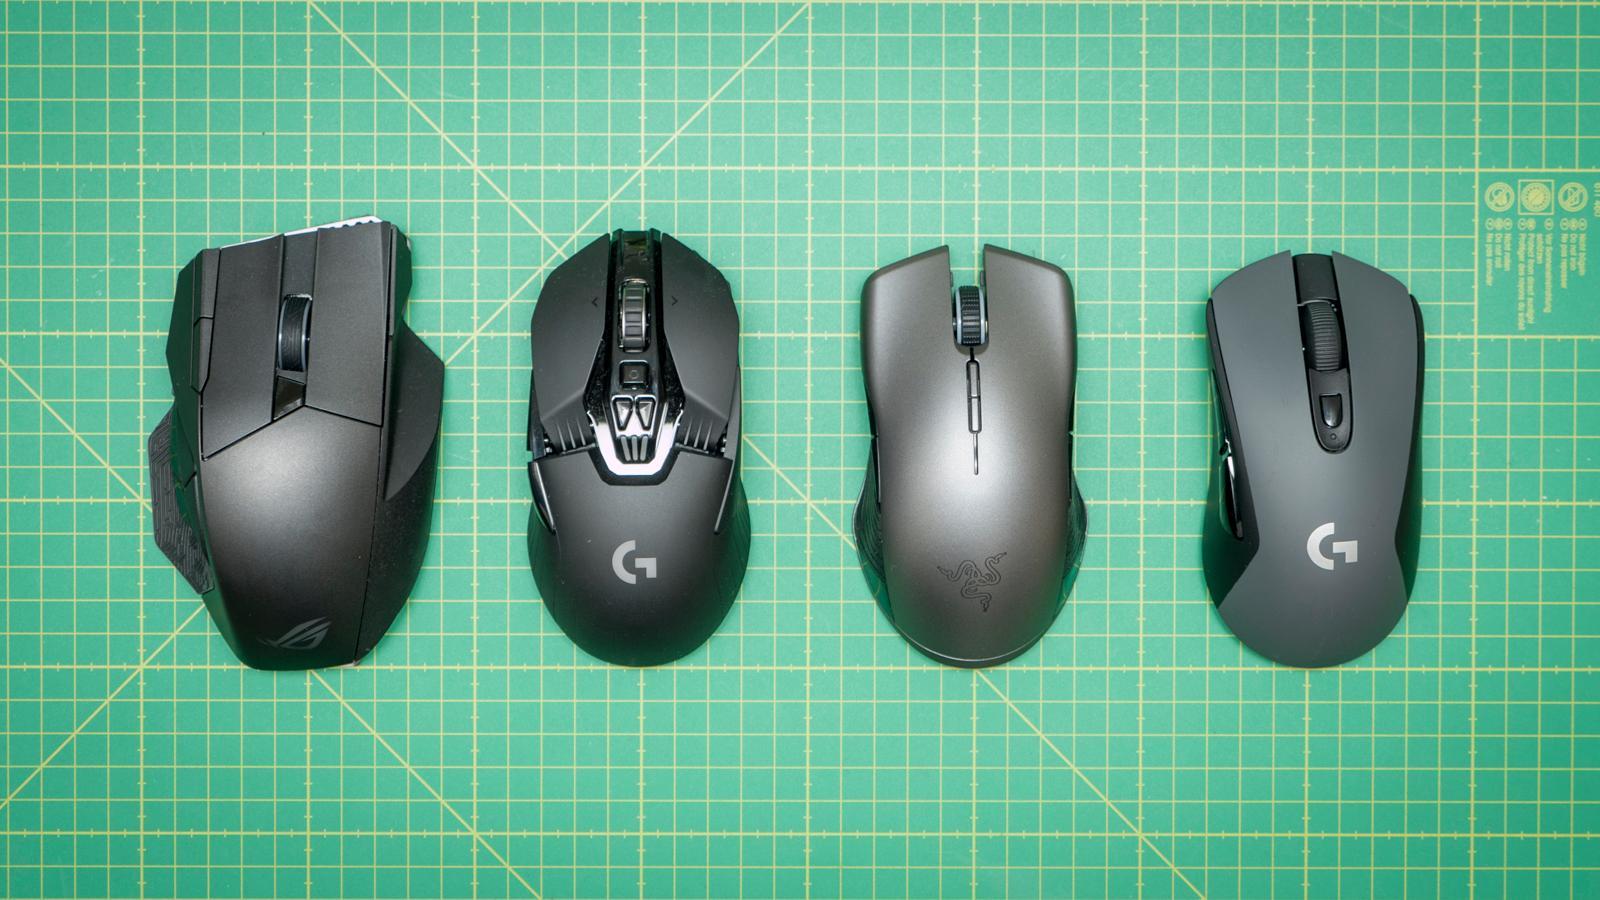 Beste mus for gaming